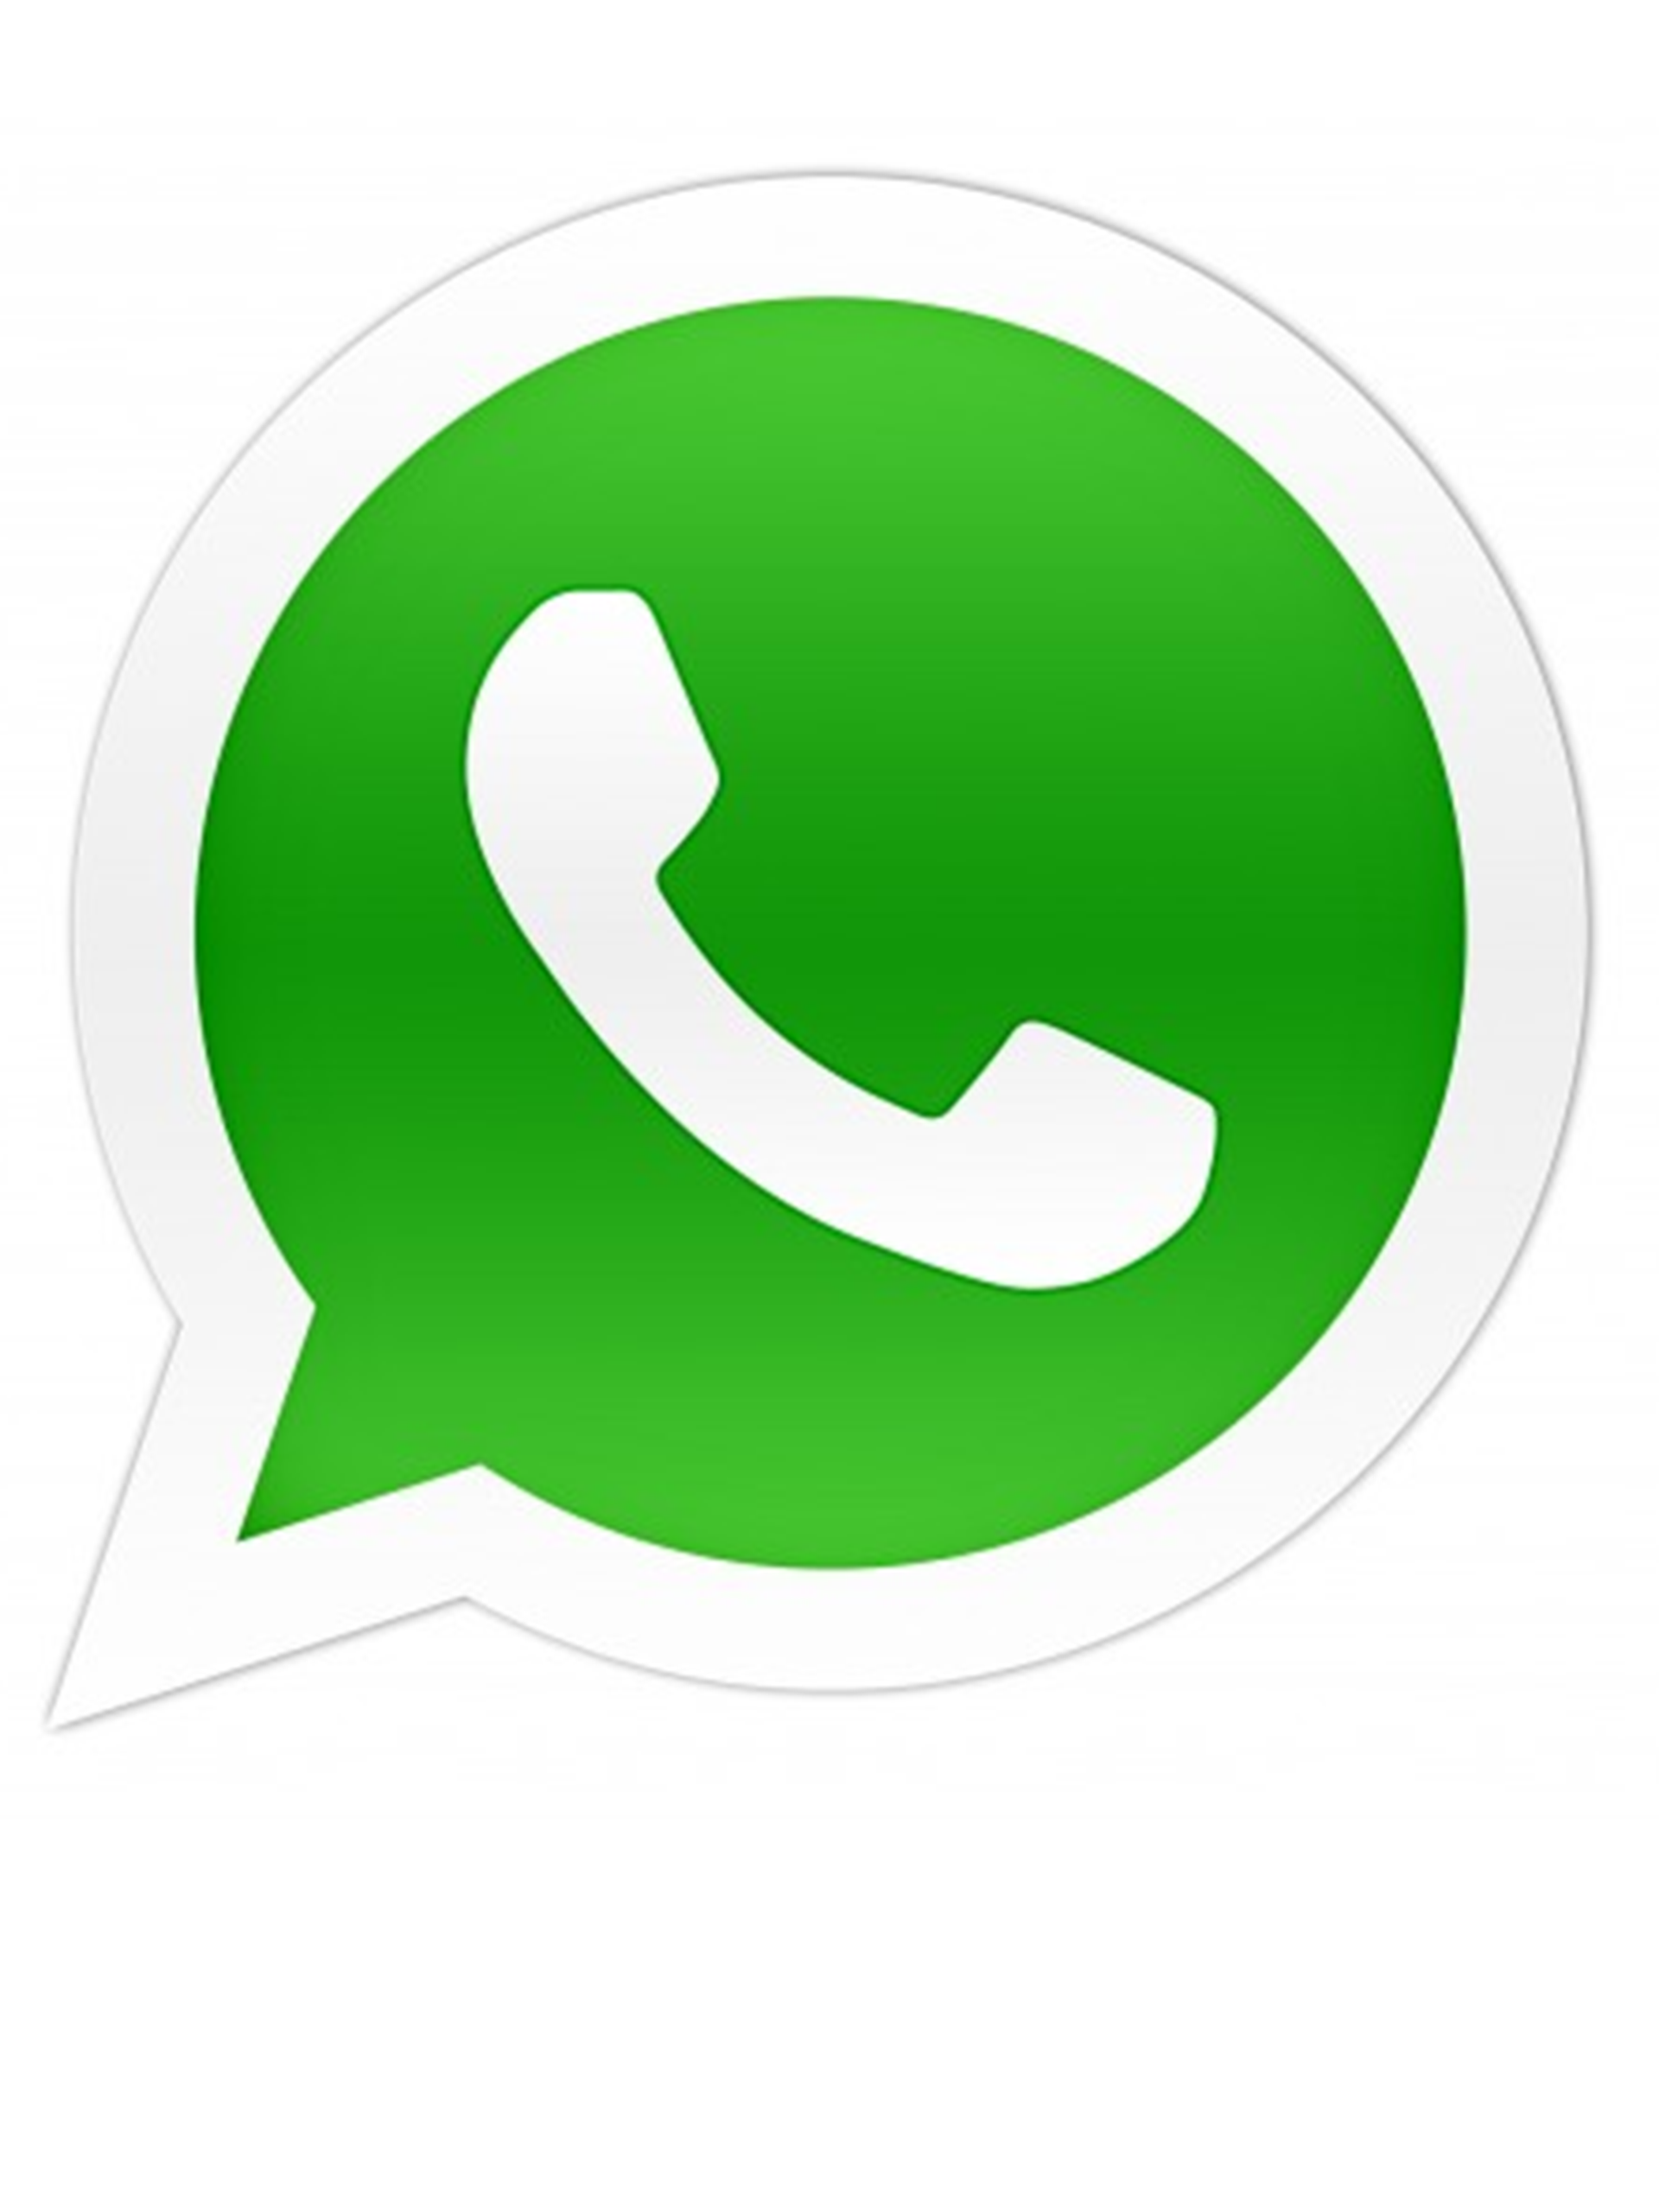 Whatsapp - Provida Alcalá de Henares